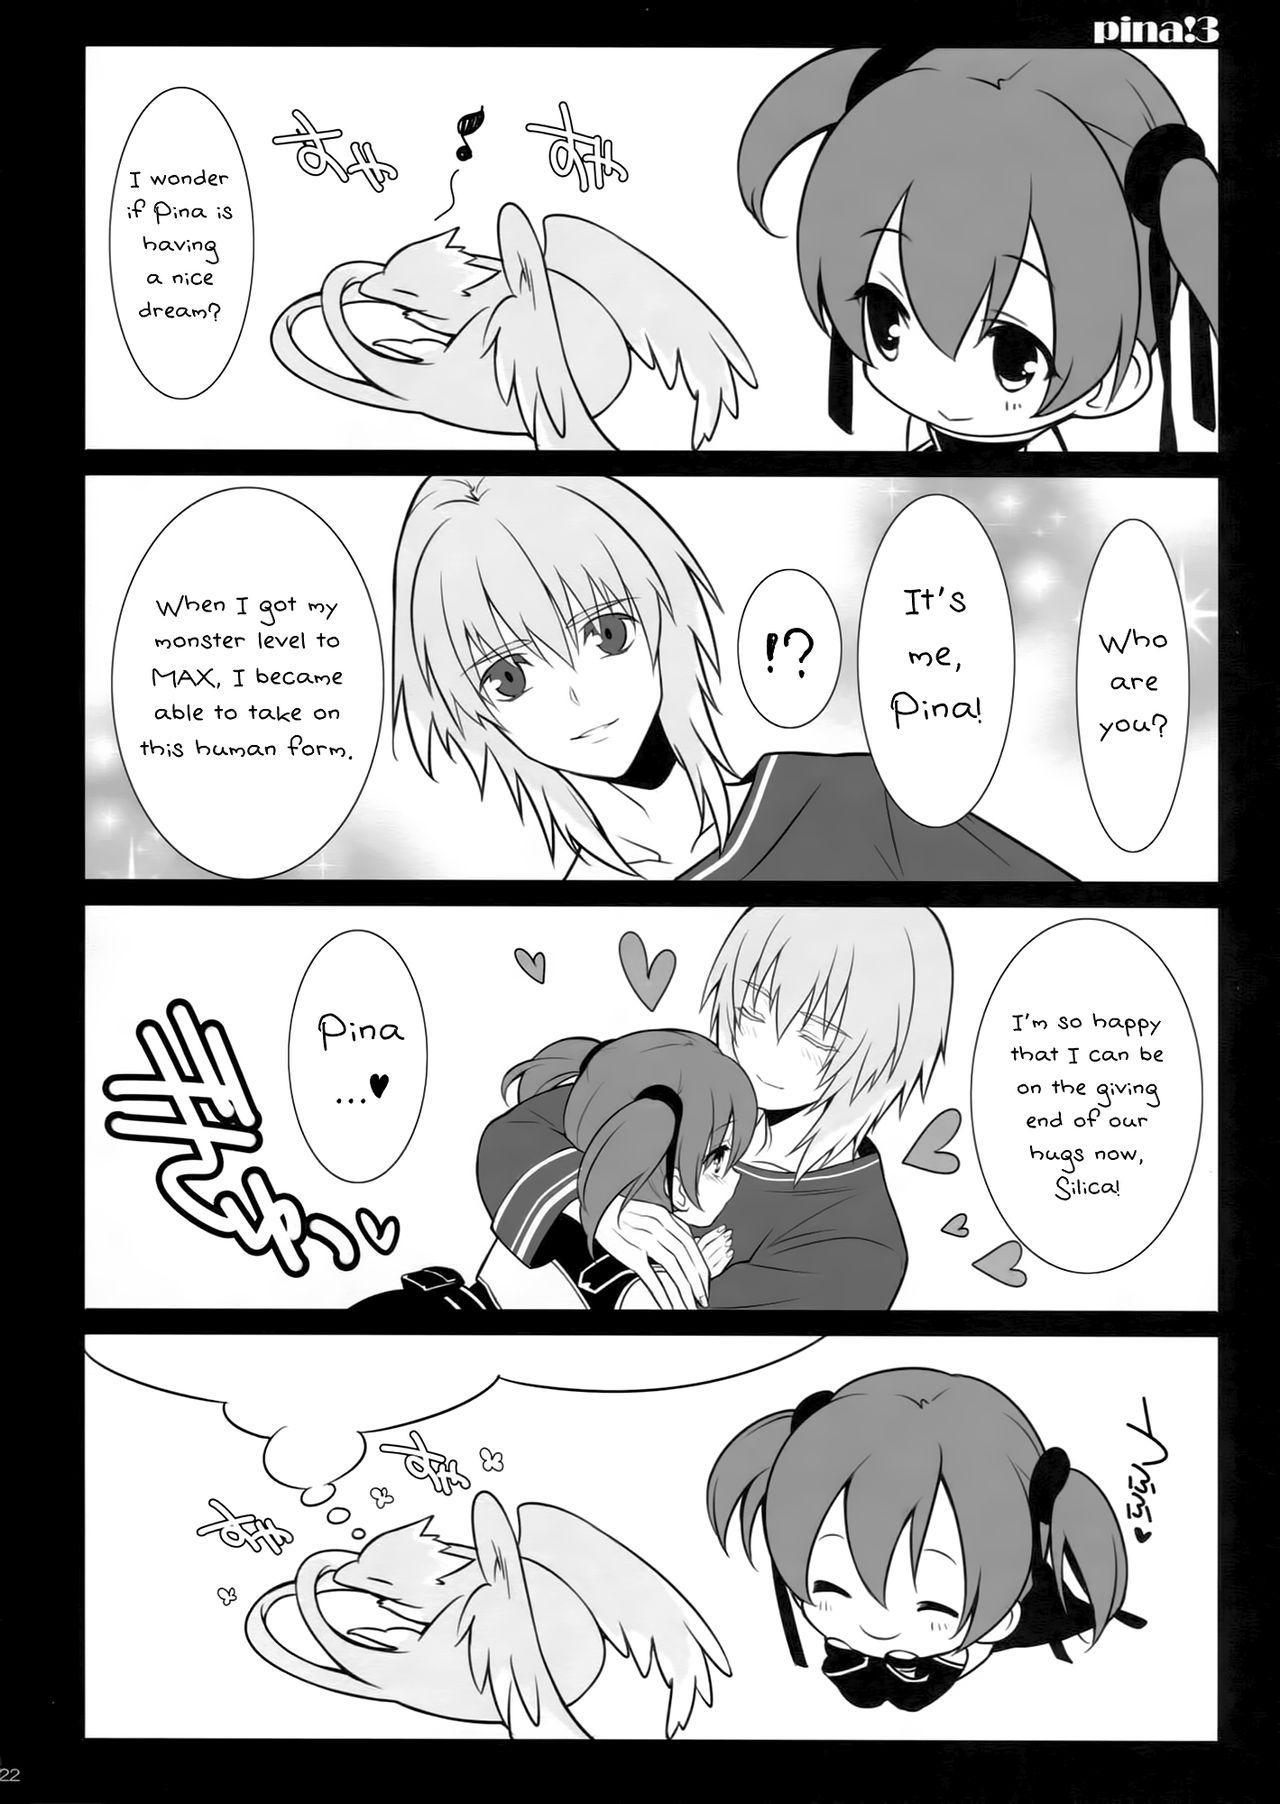 (C83) [ROYAL CROWN (Kisaragi Mizu)] Onii-chan ni wa Himitsu. | A secret to Onii-chan. (Sword Art Online) [English] [EHCOVE] 20